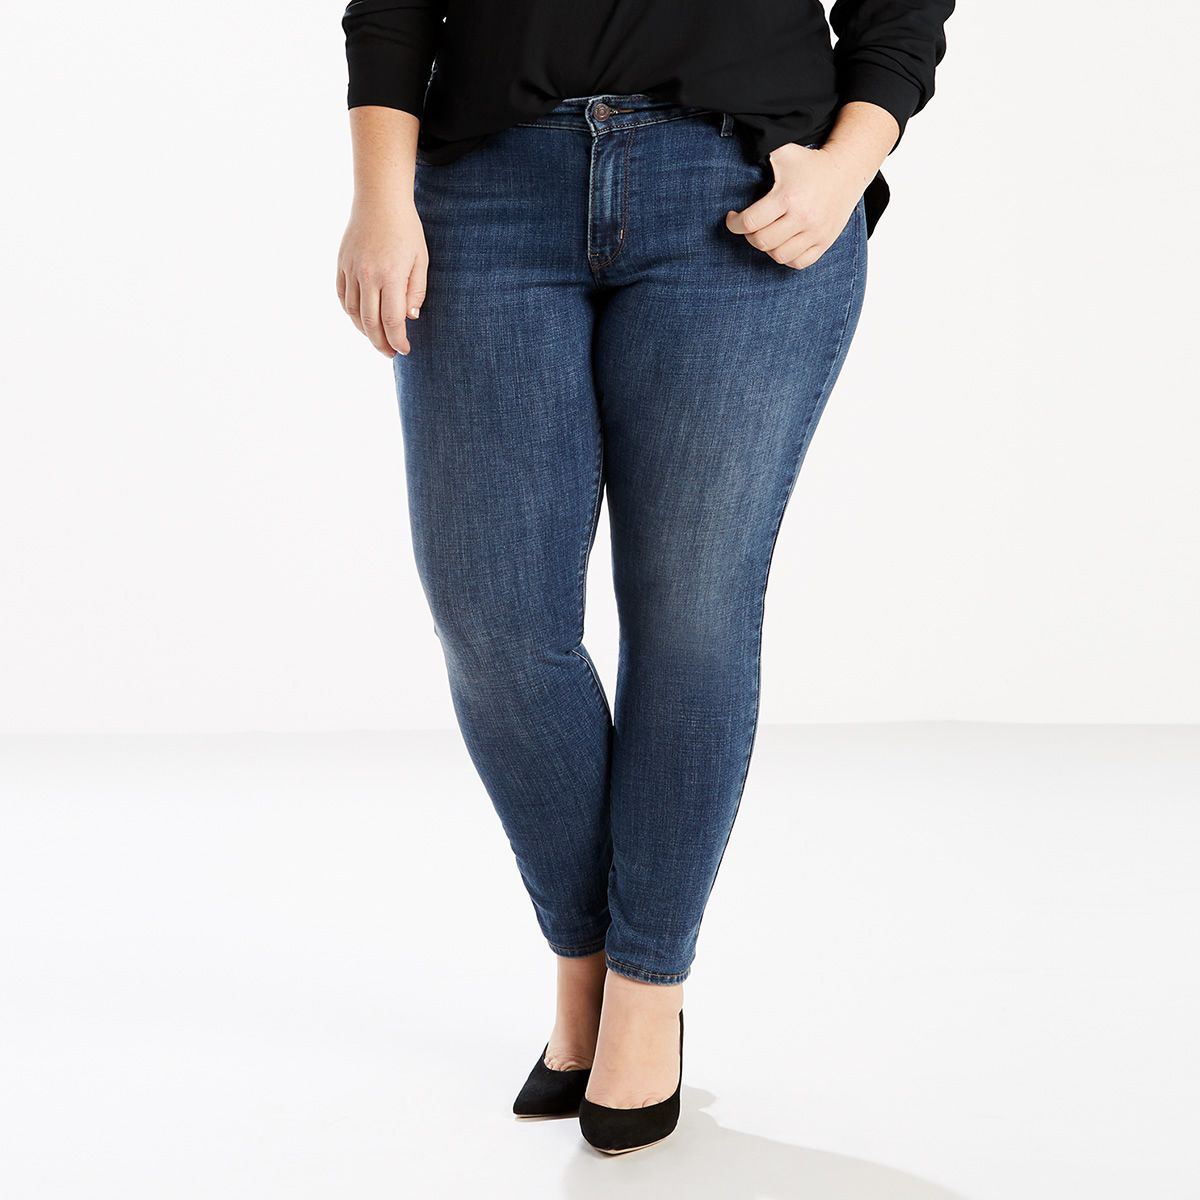 9605fd05d55 Womens Levis Jeans   Denim Apparel - Macy s